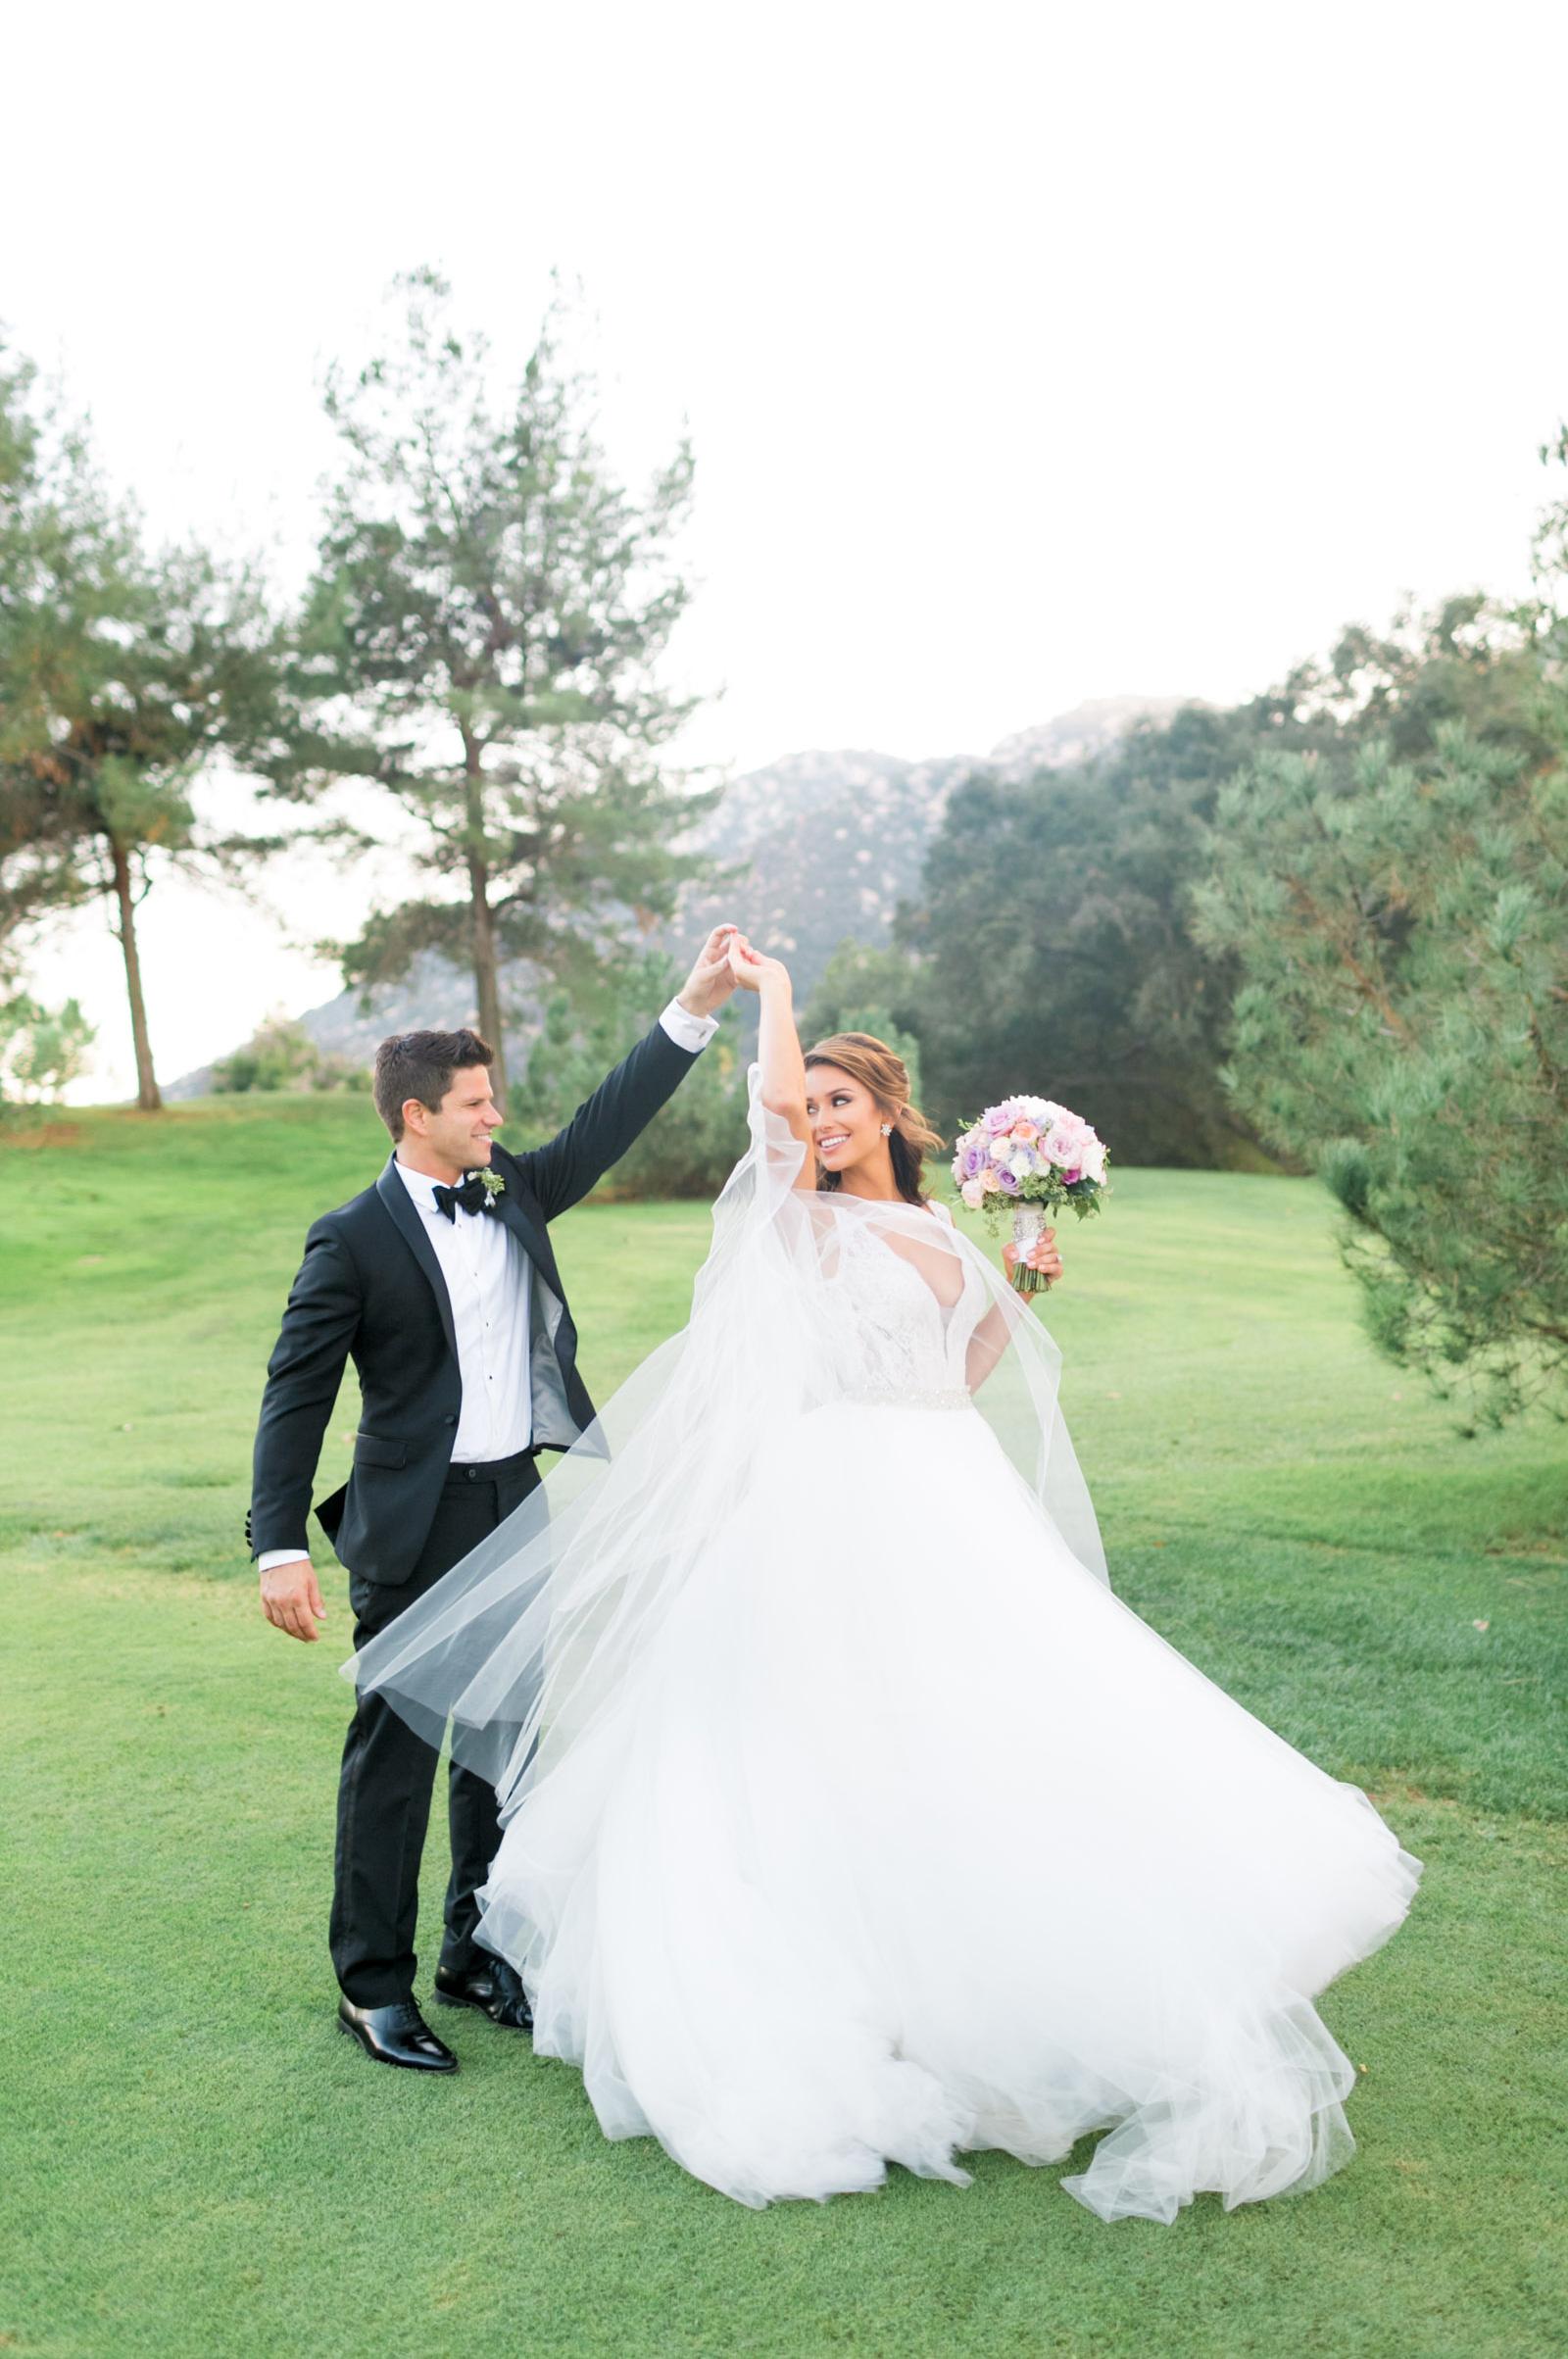 Daniel-&-Nia-Booko-Wedding-Natalie-Schutt-Photography_01.jpg